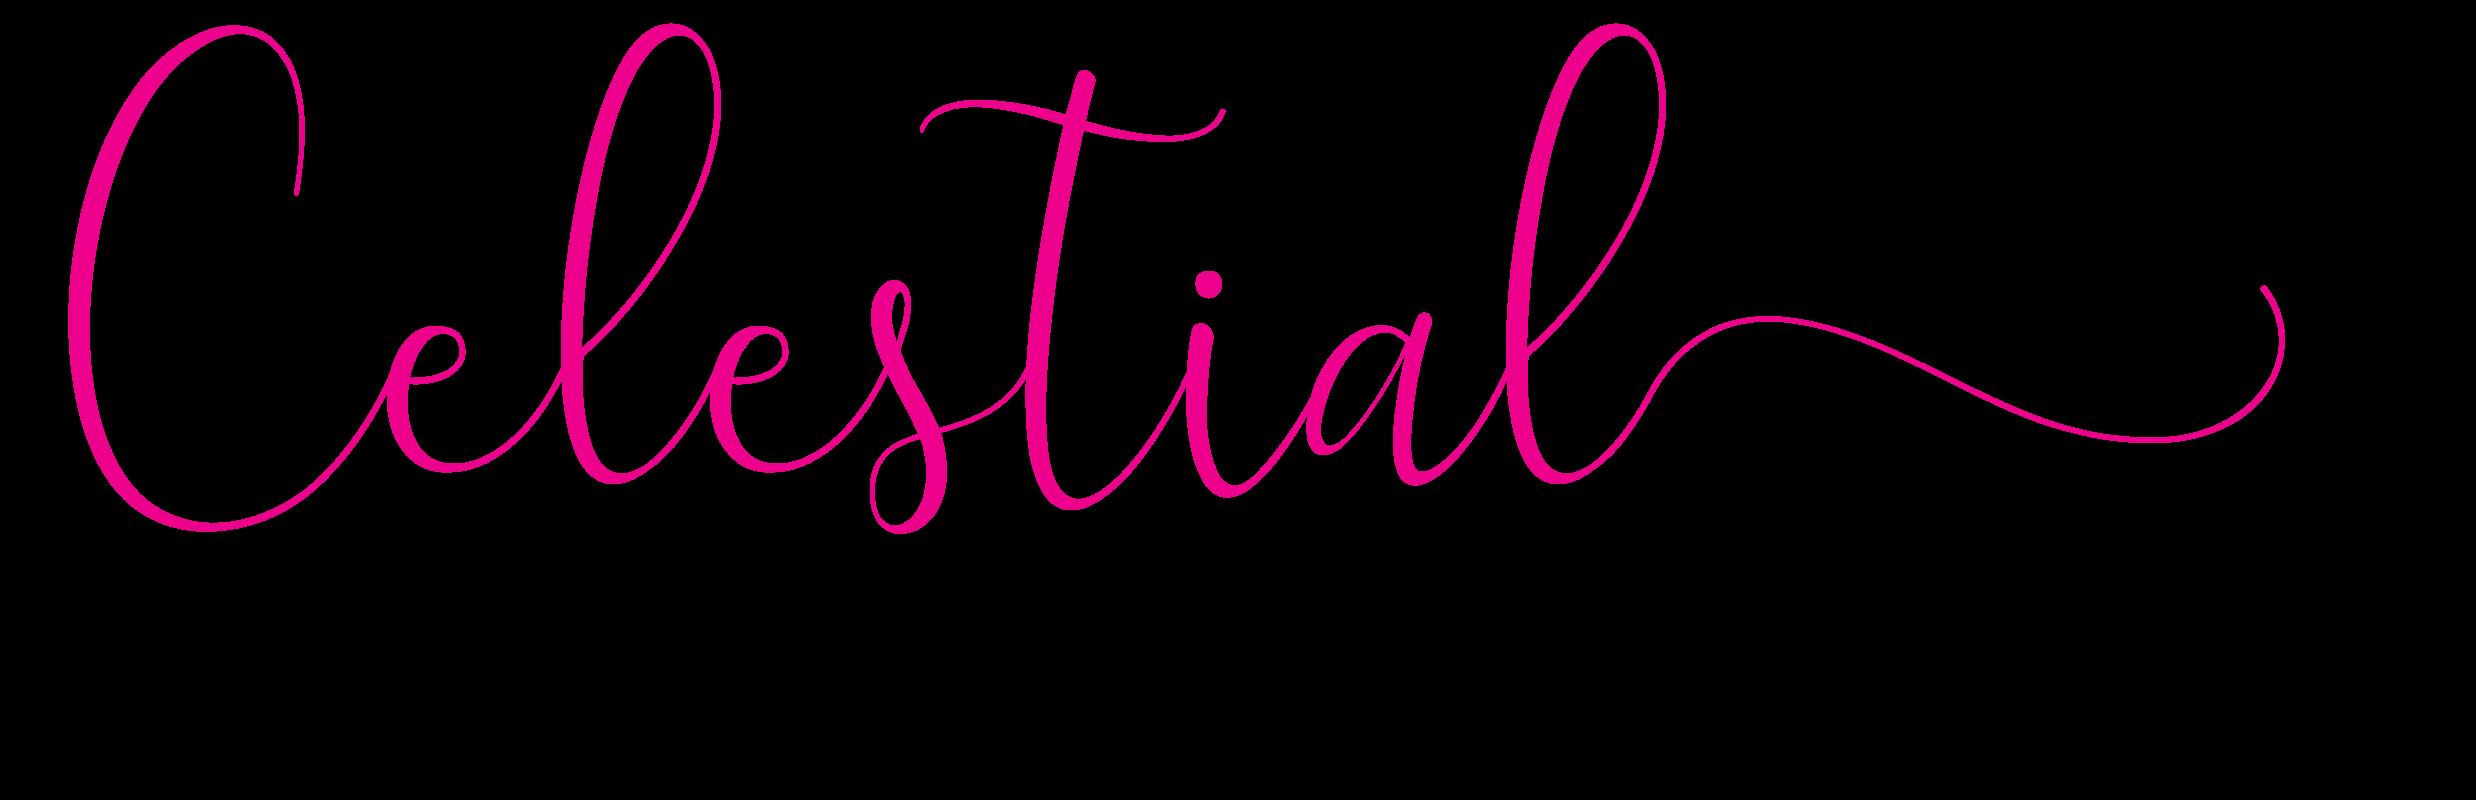 Celestial Sisterhood Logo